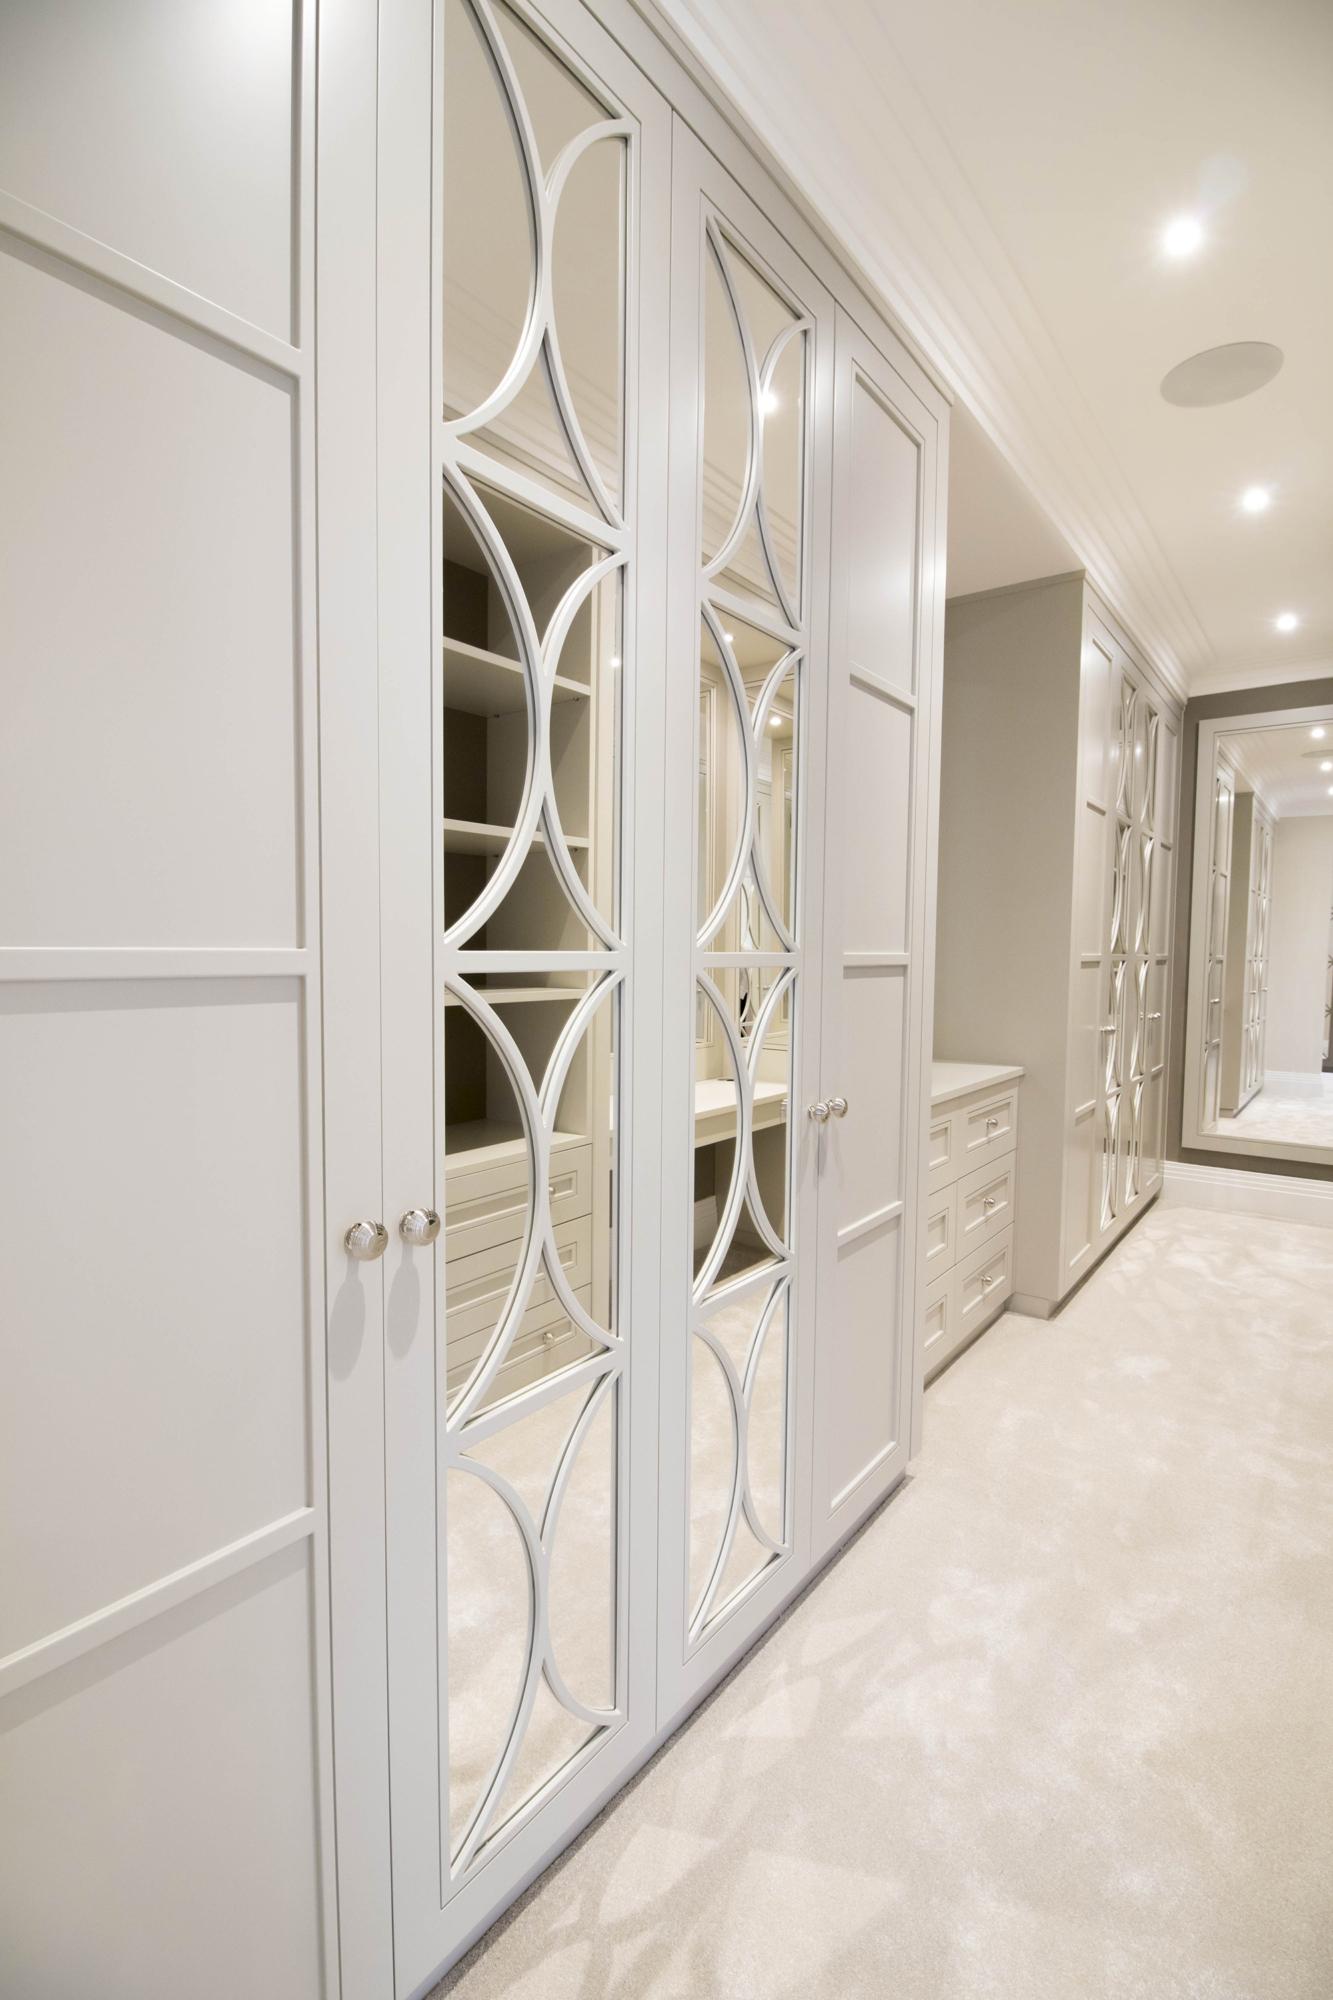 mirrored wardrobe